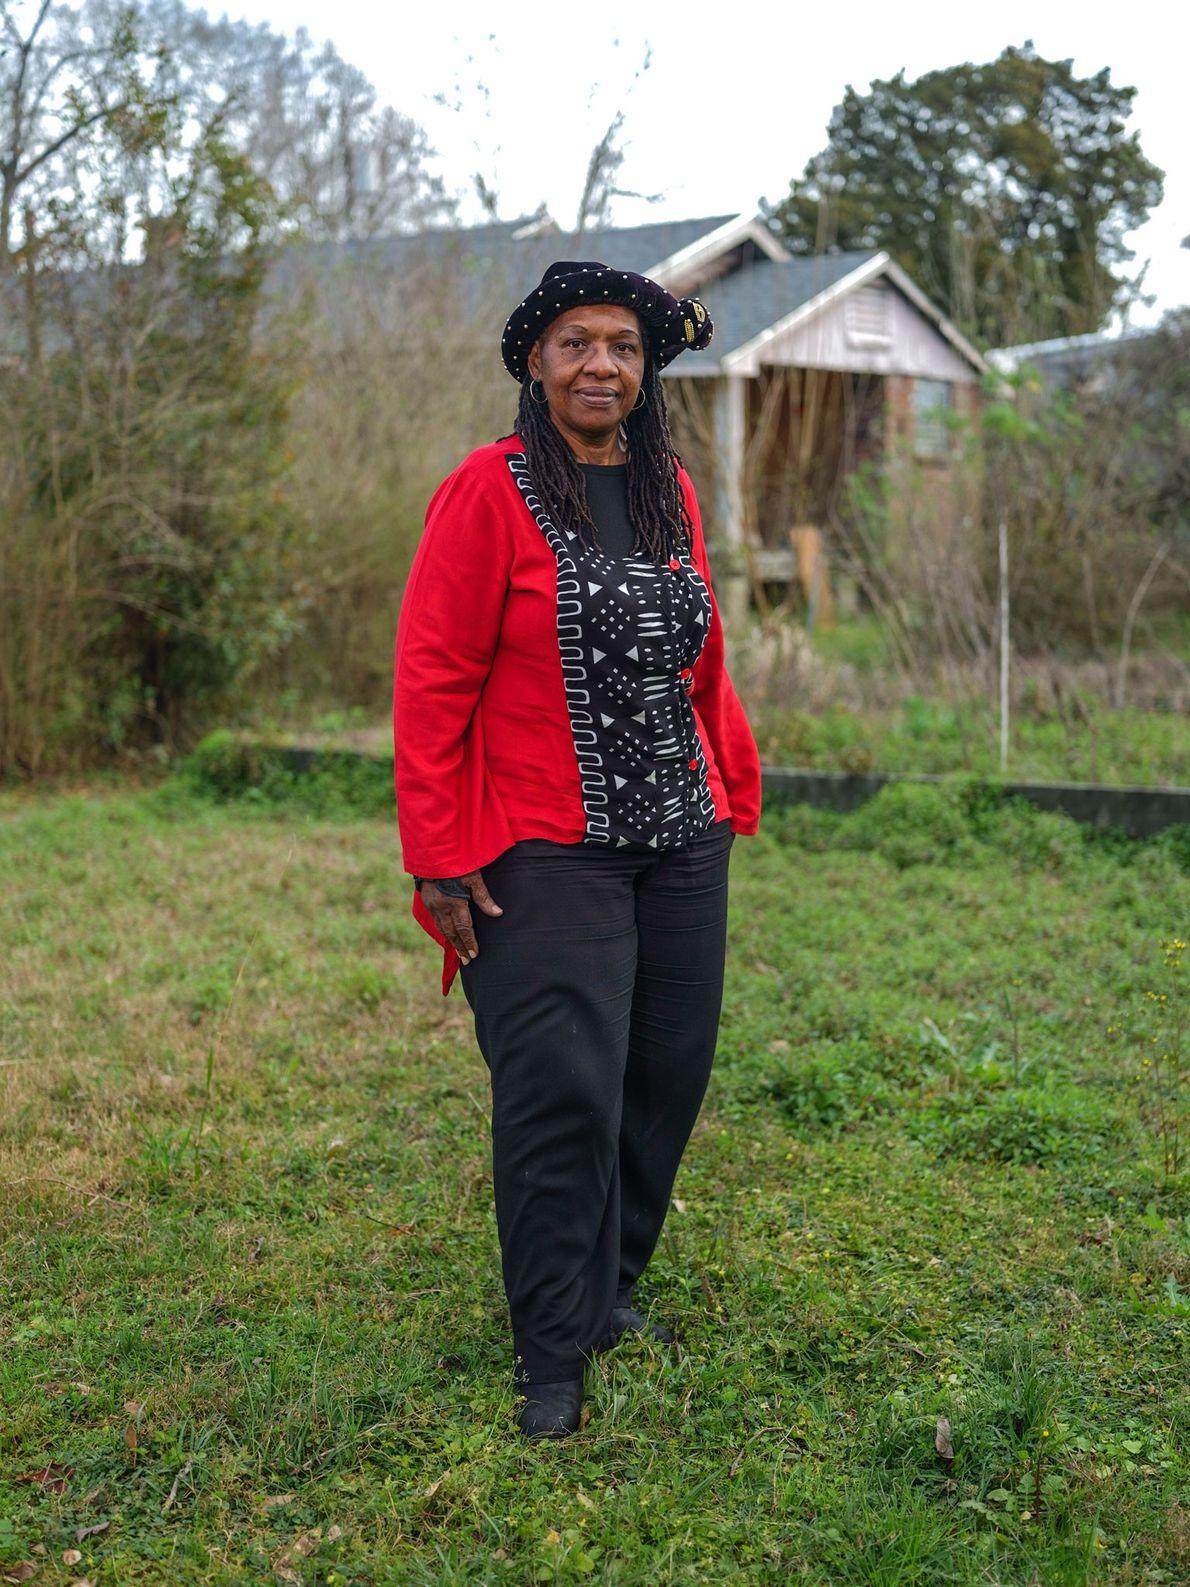 Os fundadores de Africatown eram marginalizados pelos seus sotaques africanos, diz Vernetta Hynson, descendente de Pollee ...